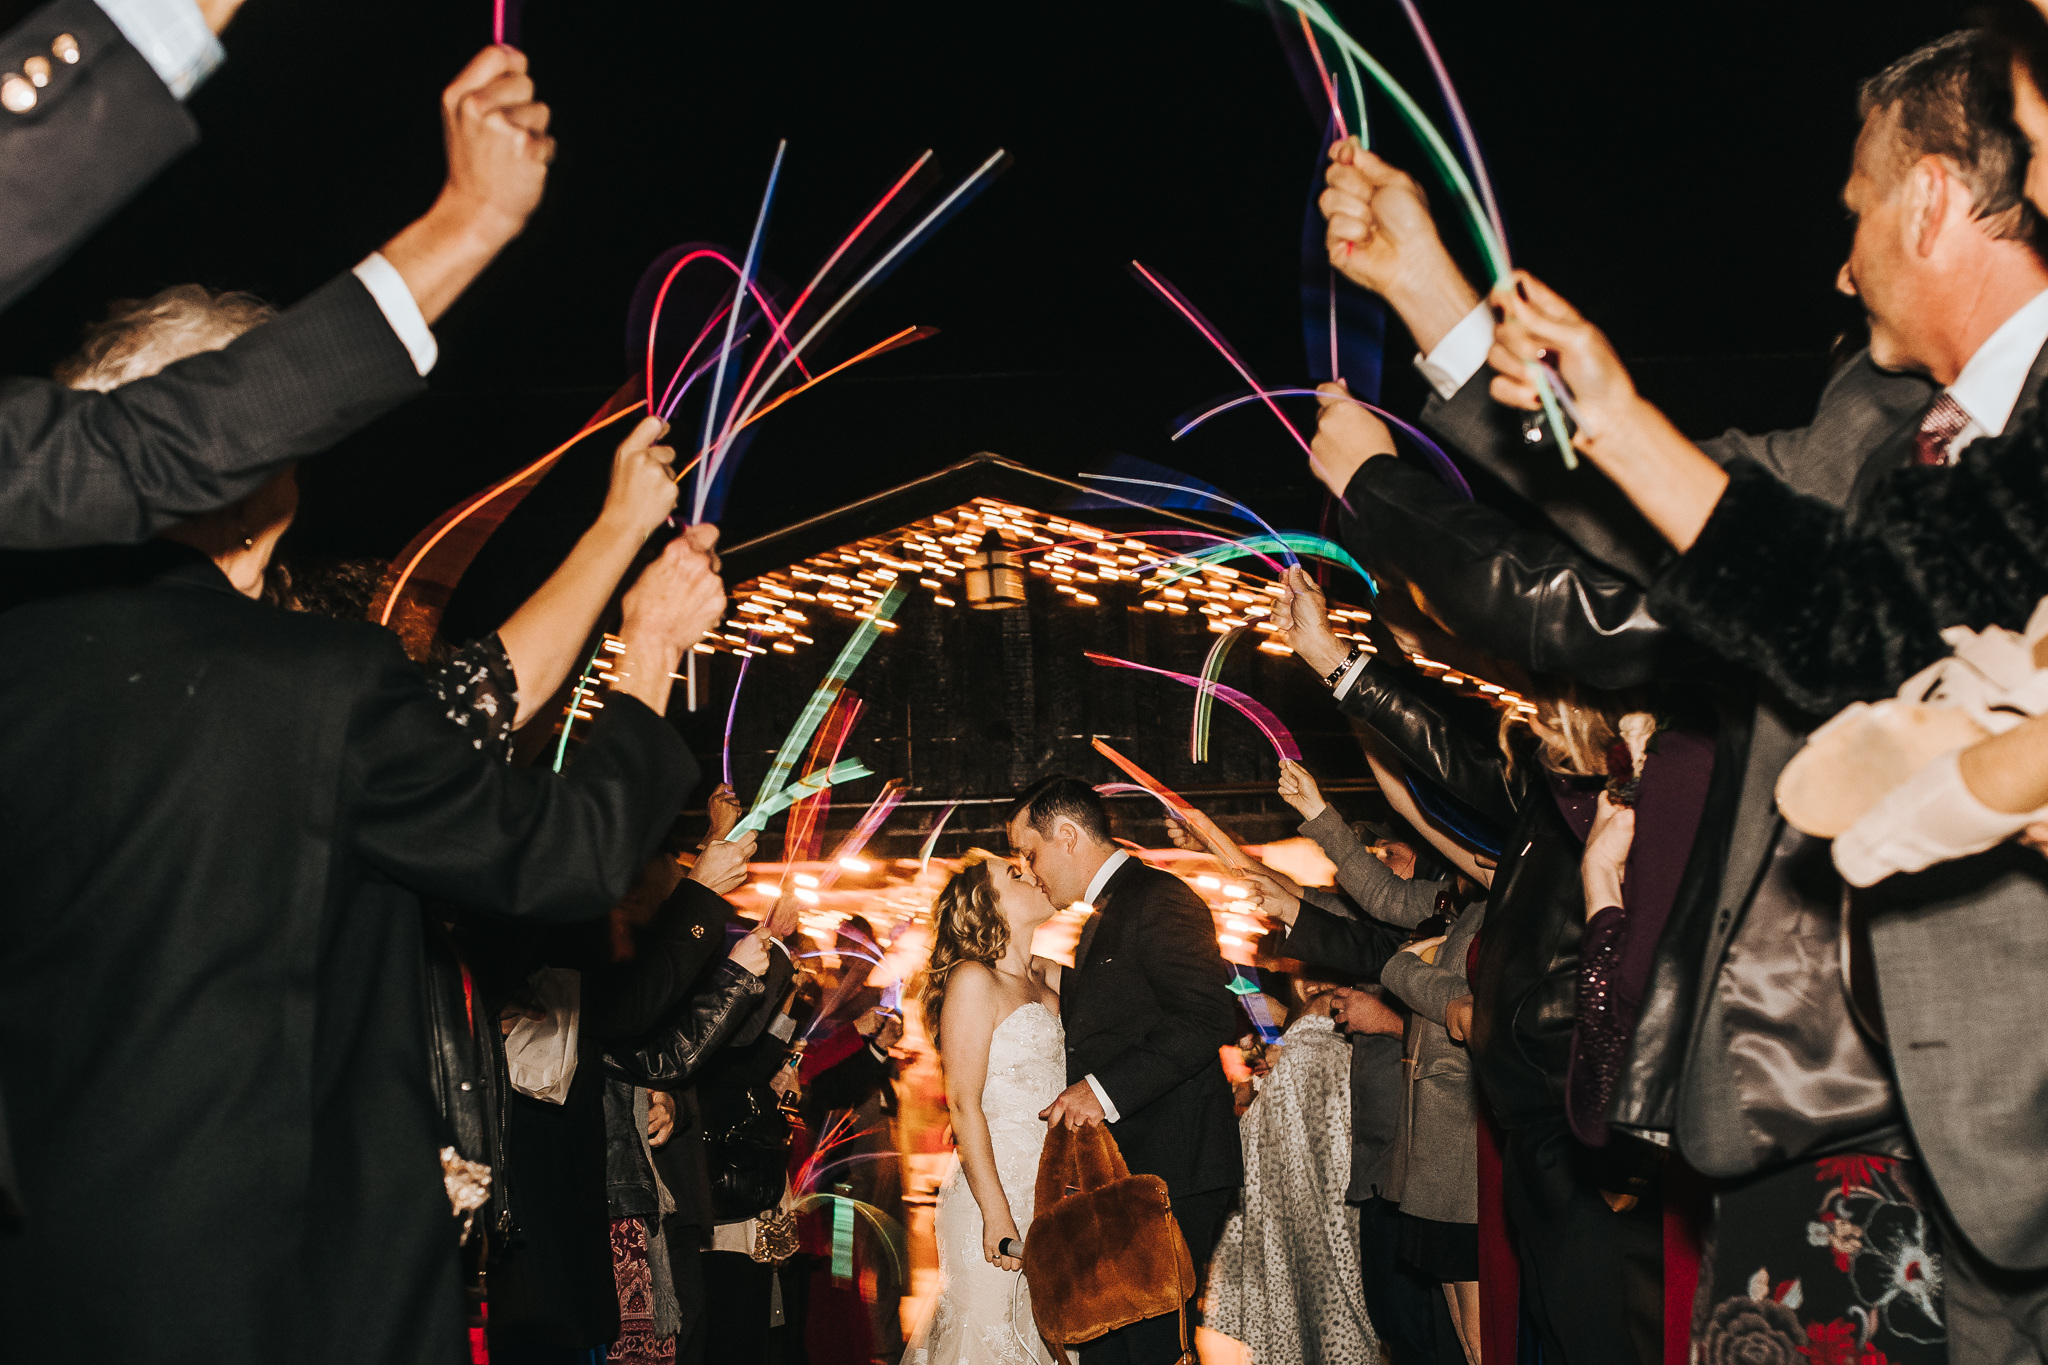 0190 Ariana Jordan Photo - Cameron & Lauren's Wedding at Talon Winery  8882.jpg